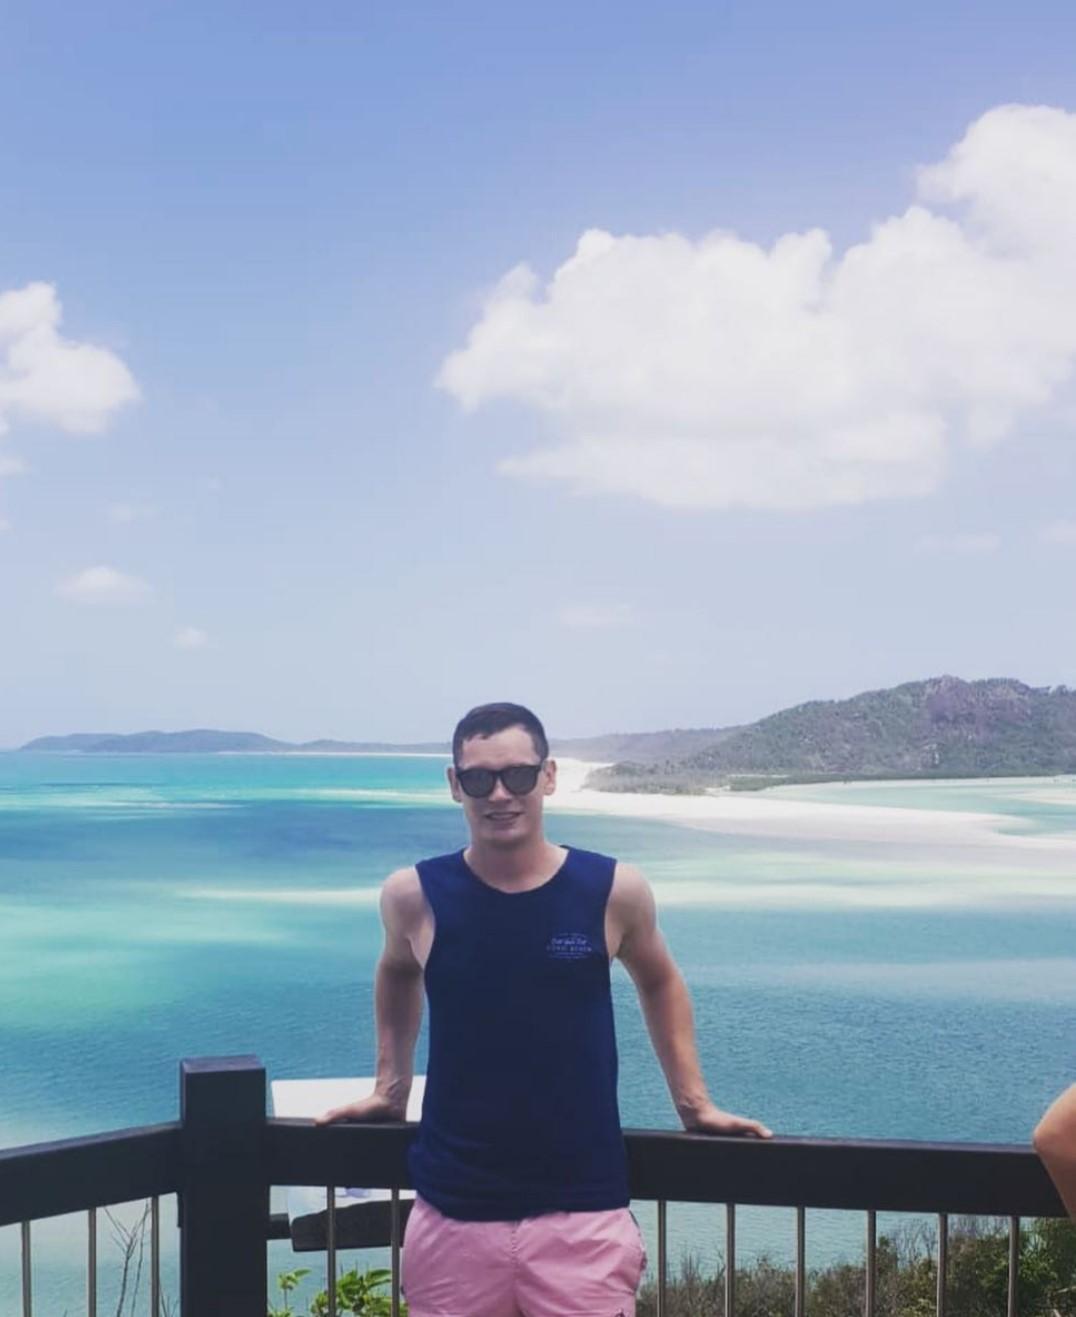 James at Whitsunday Island off the coast of northern Australia